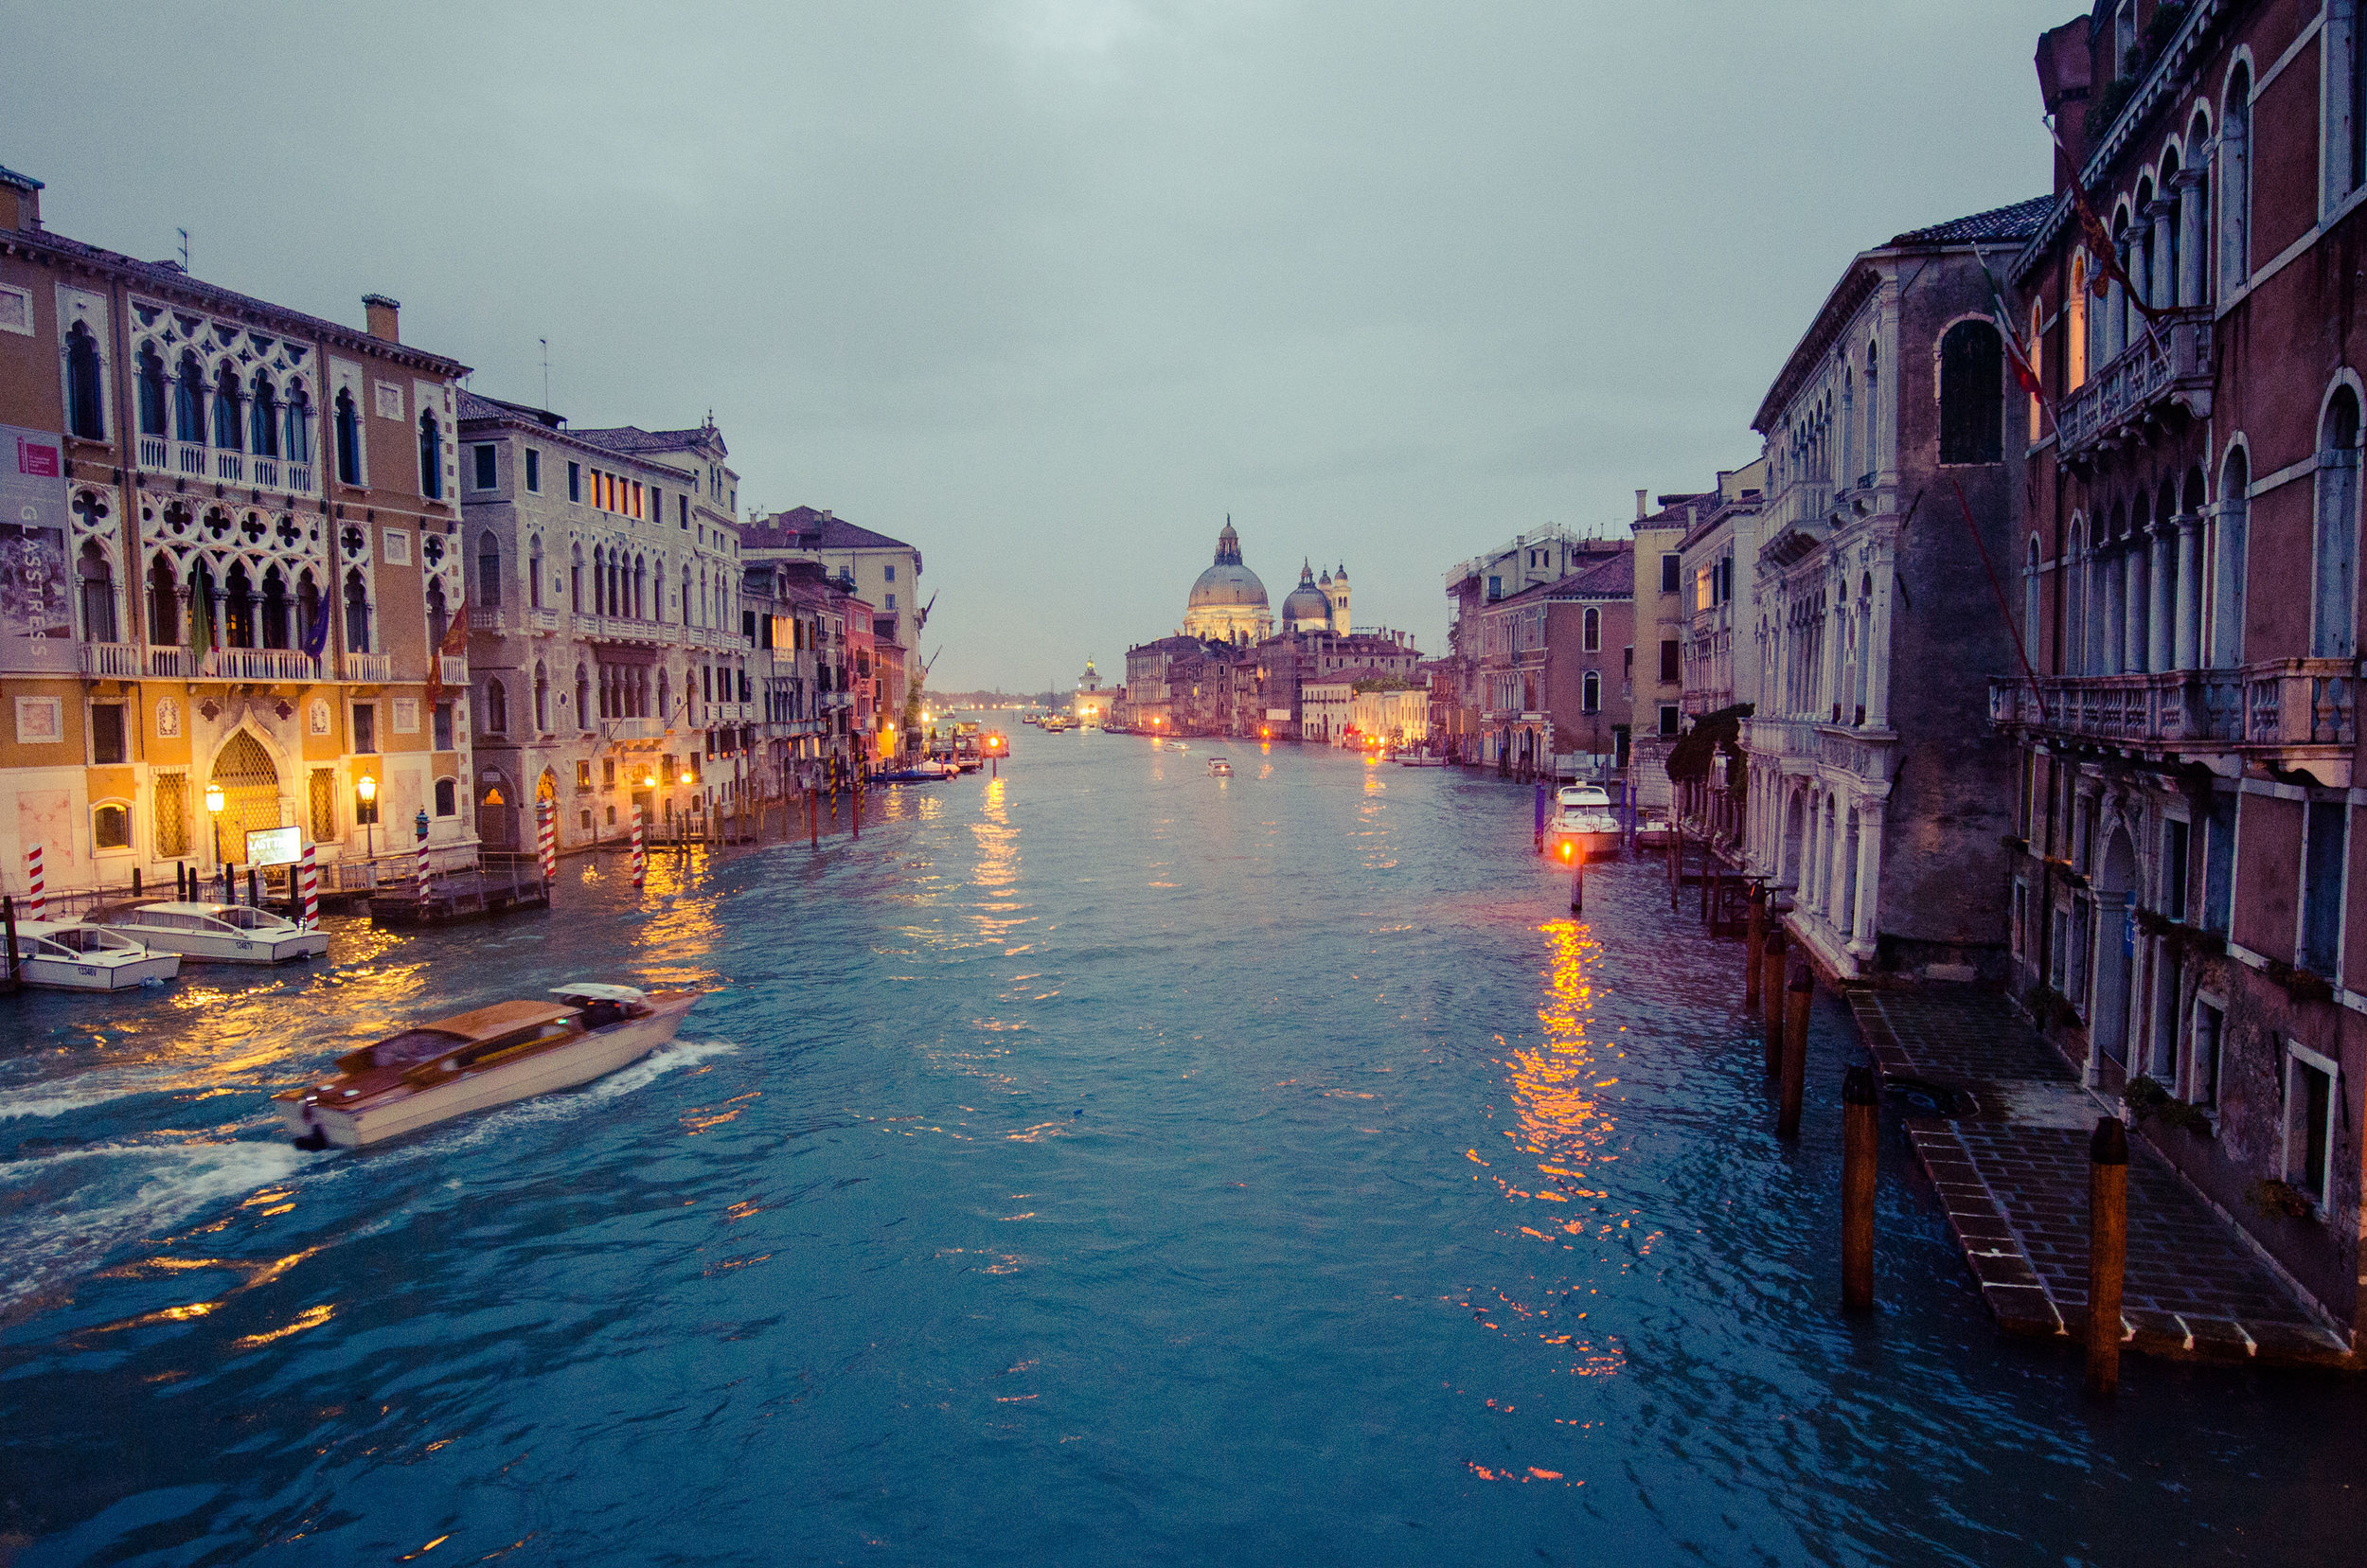 Italy2013-16_sml.jpg